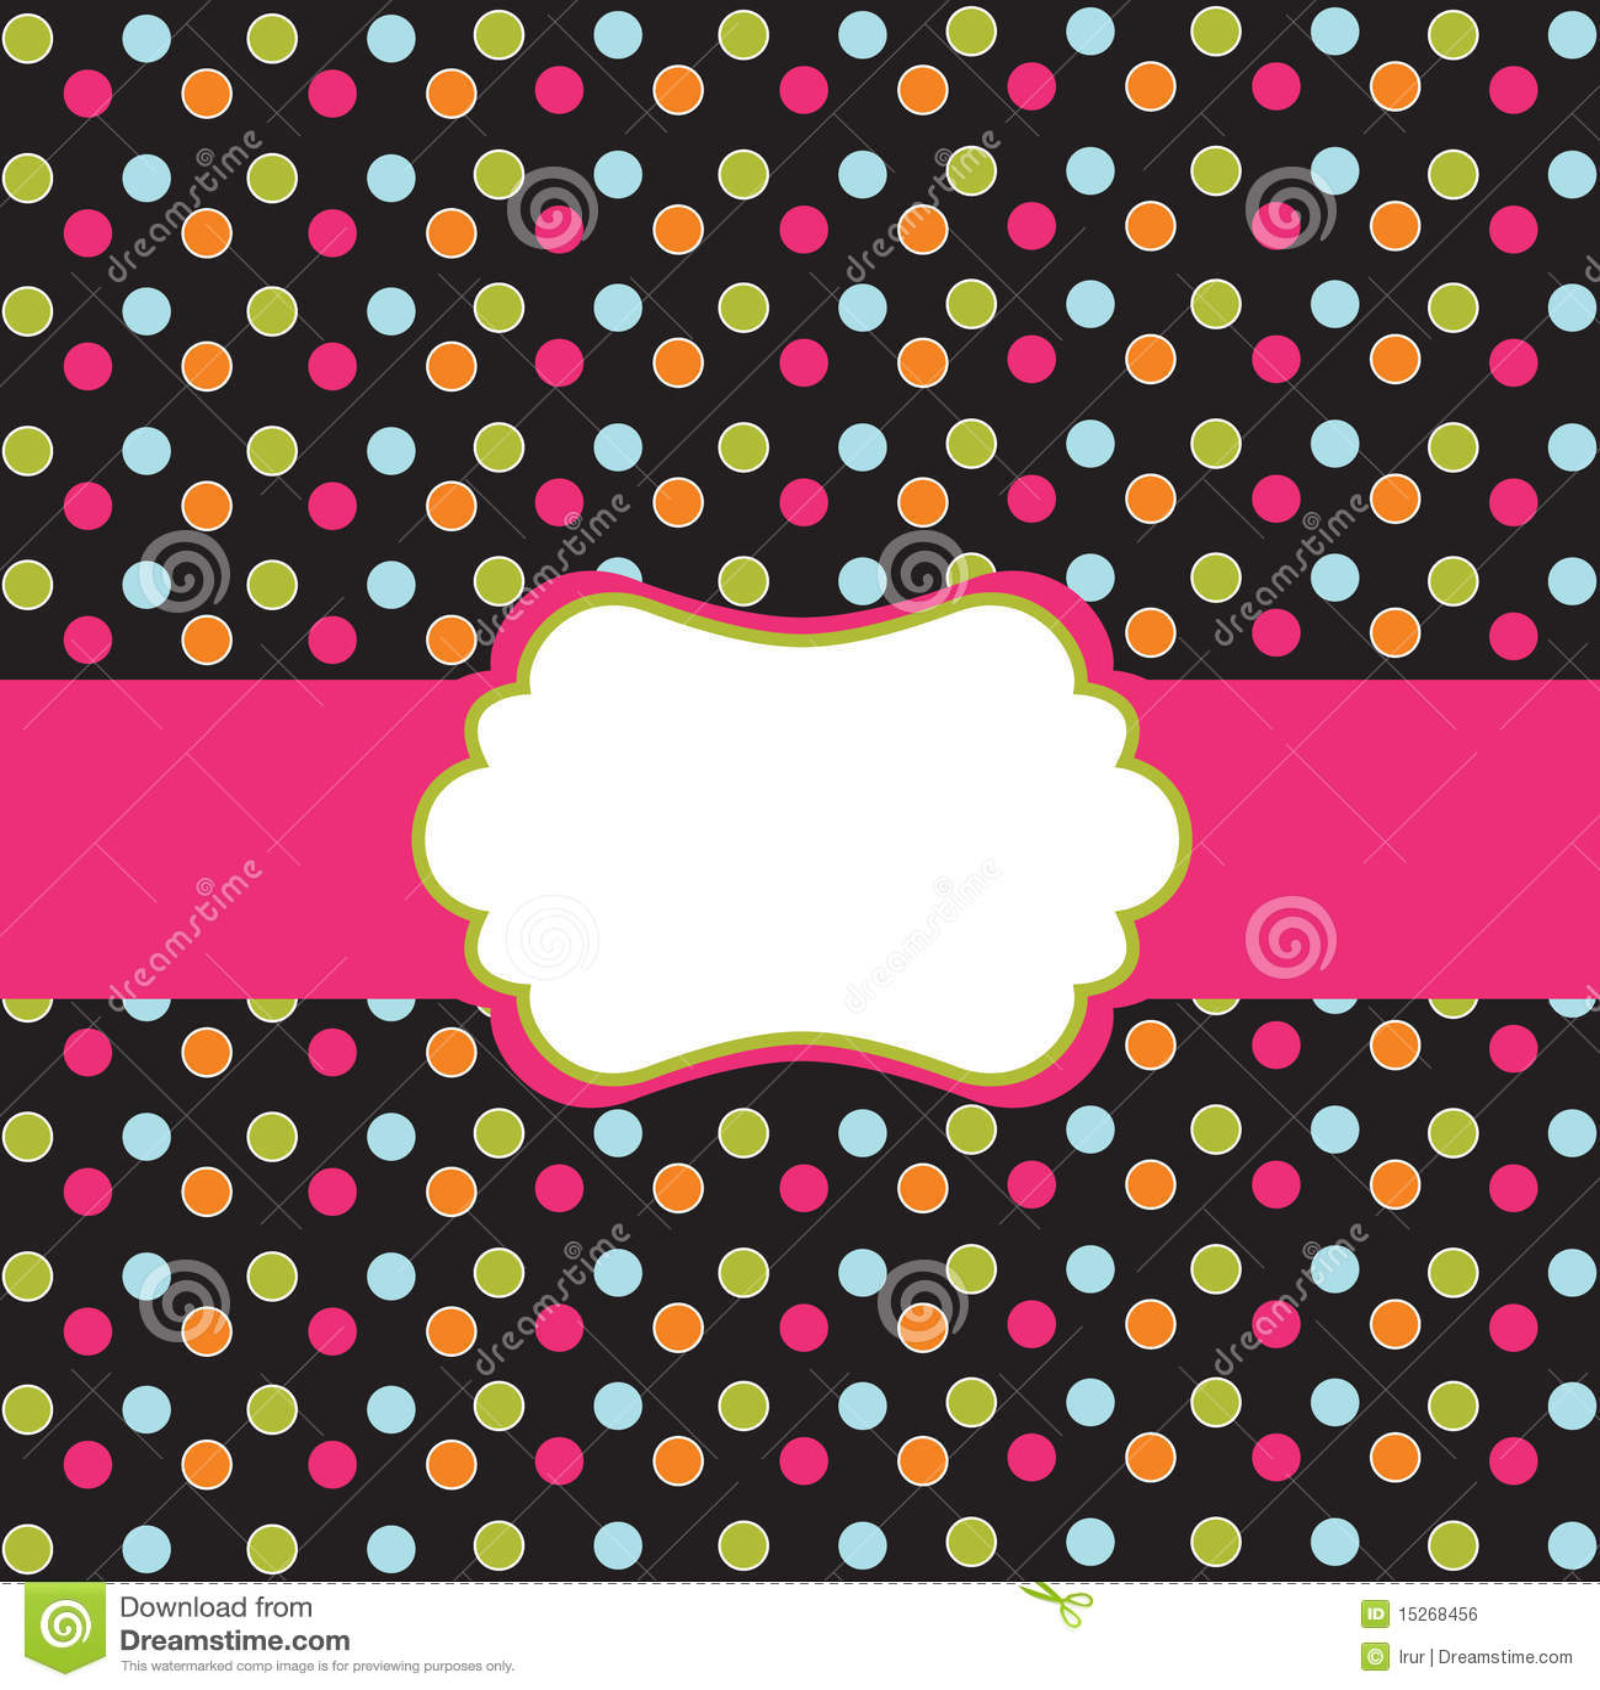 designs images polka dots - photo #13